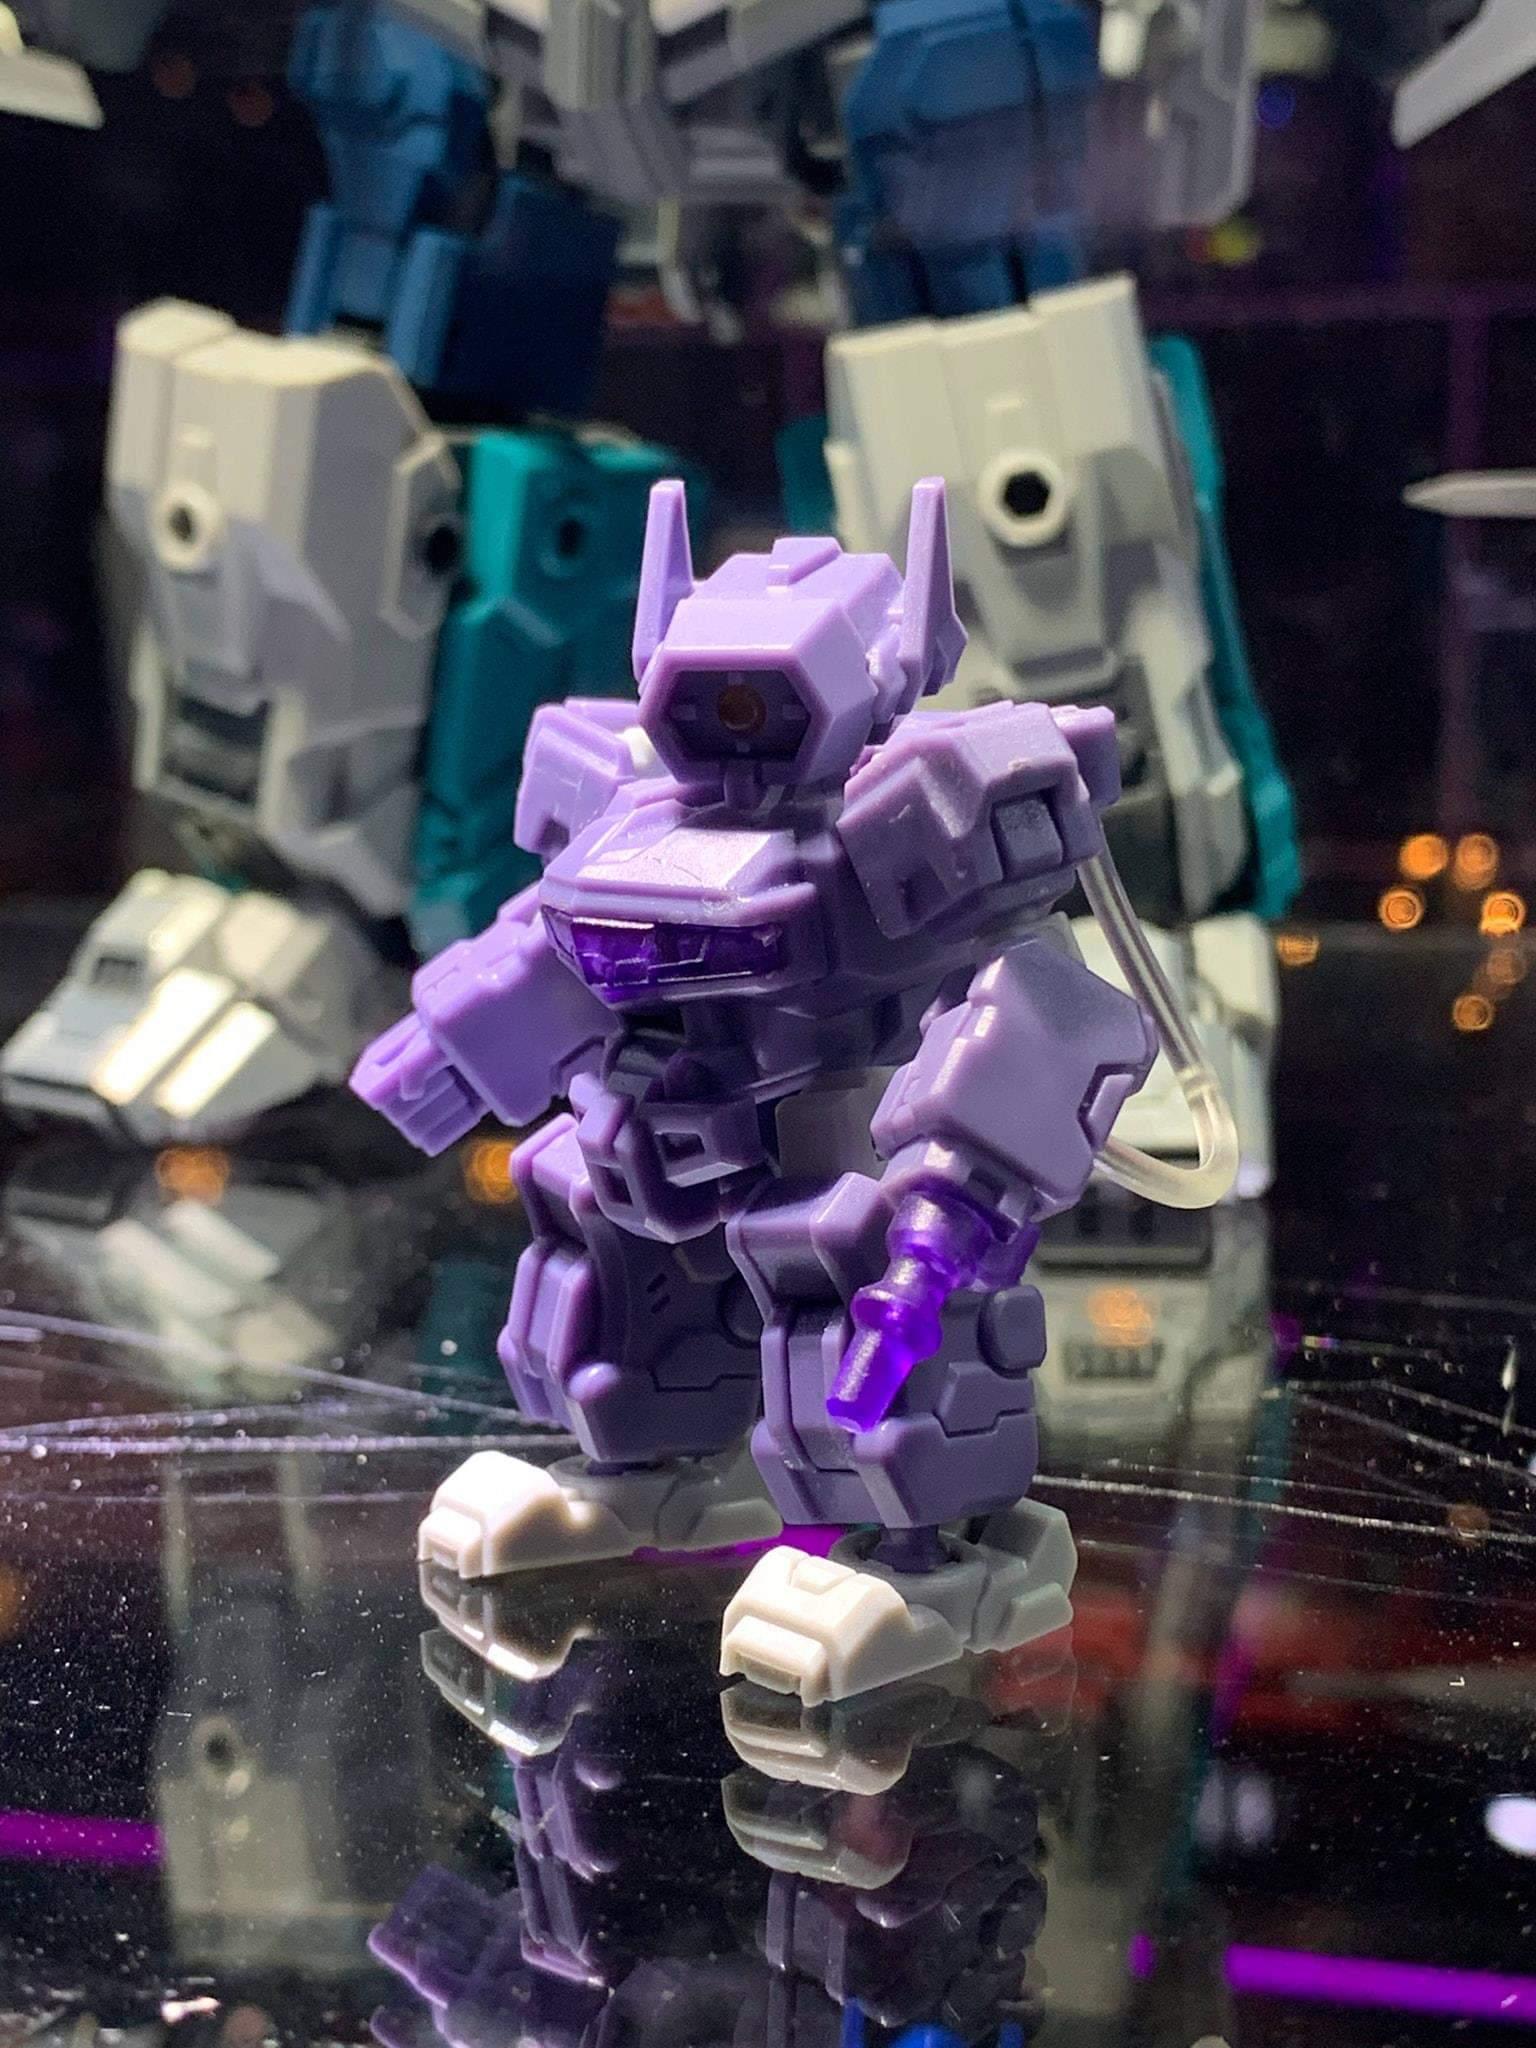 Produit Tiers - Figurine miniature déformé (transformable) - Par: Hero Hobby + MiniPower + Master Made - Page 2 PiLi9m0W_o